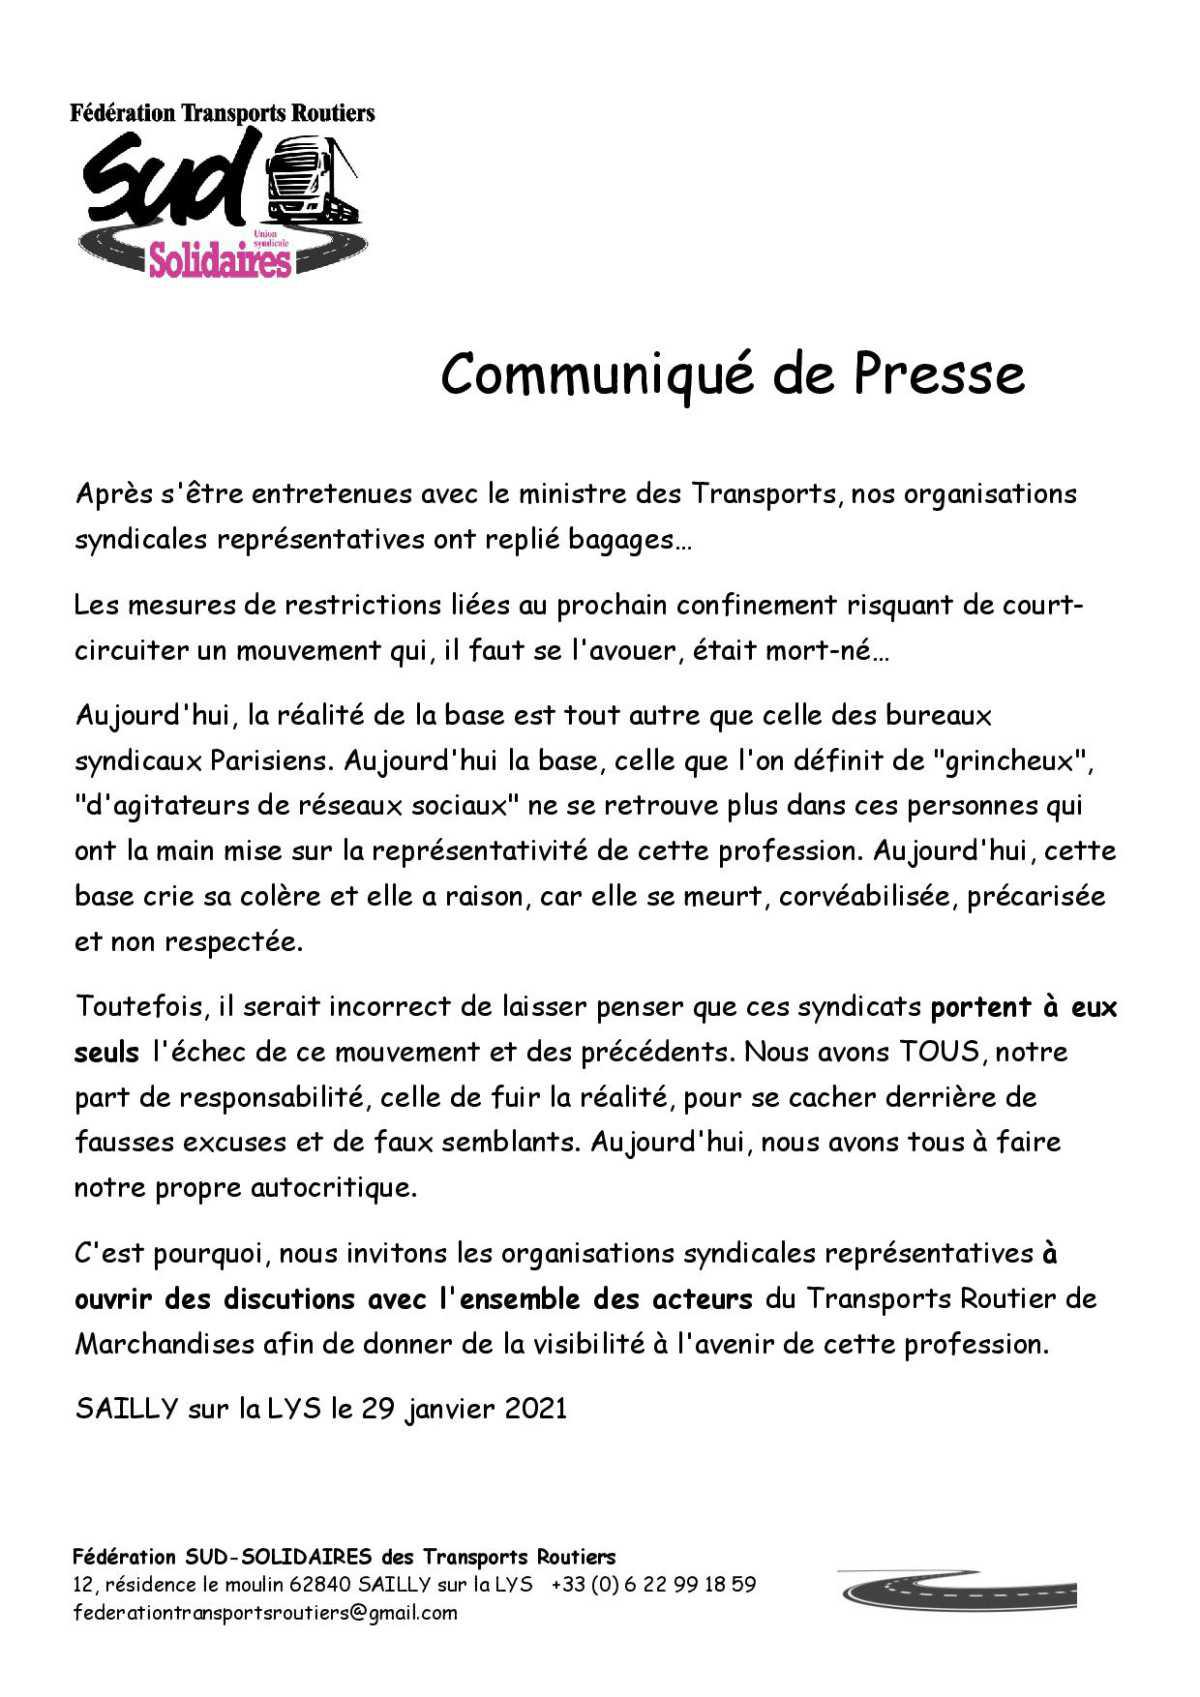 Com presse Fédération SUD transports Routiers 29 01 2020